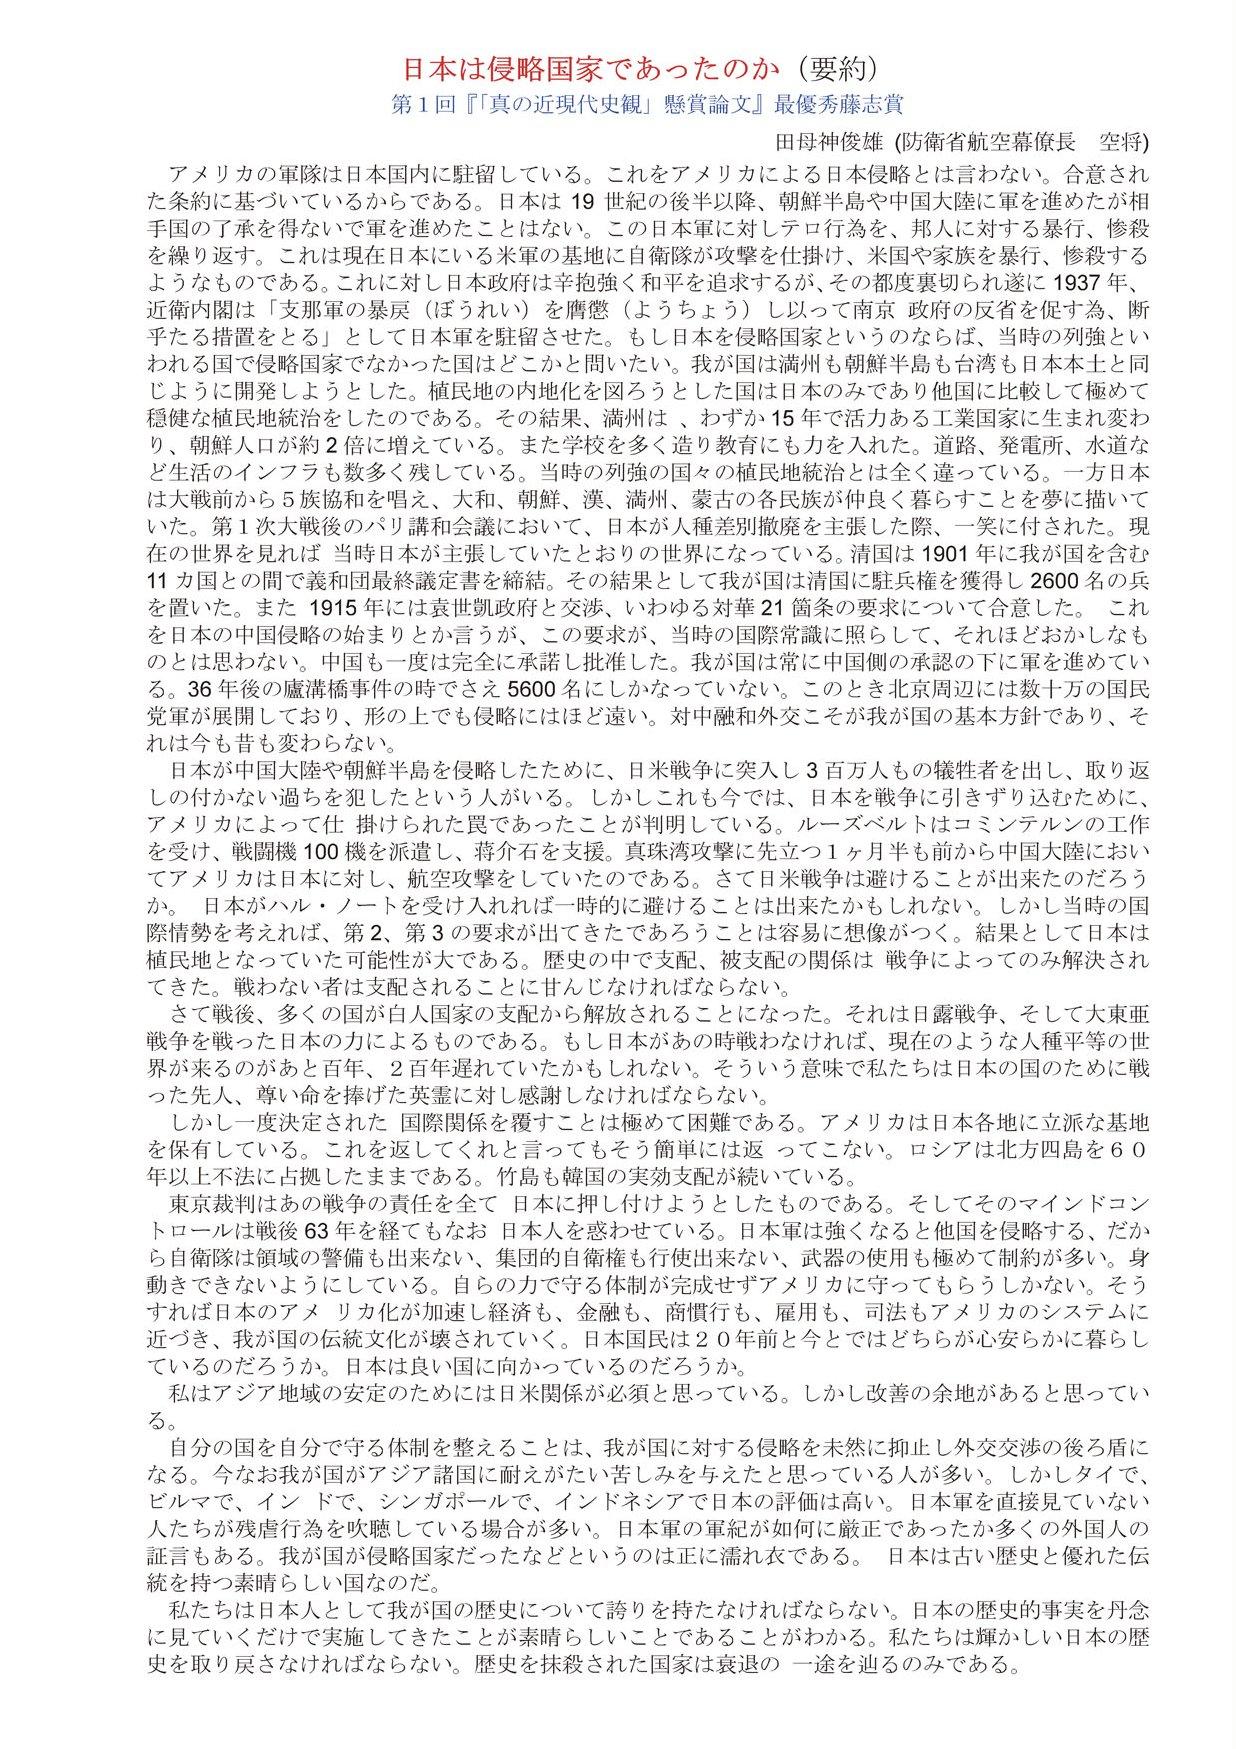 http://fukuoka.goyu.jp/%E8%A3%8F.jpg